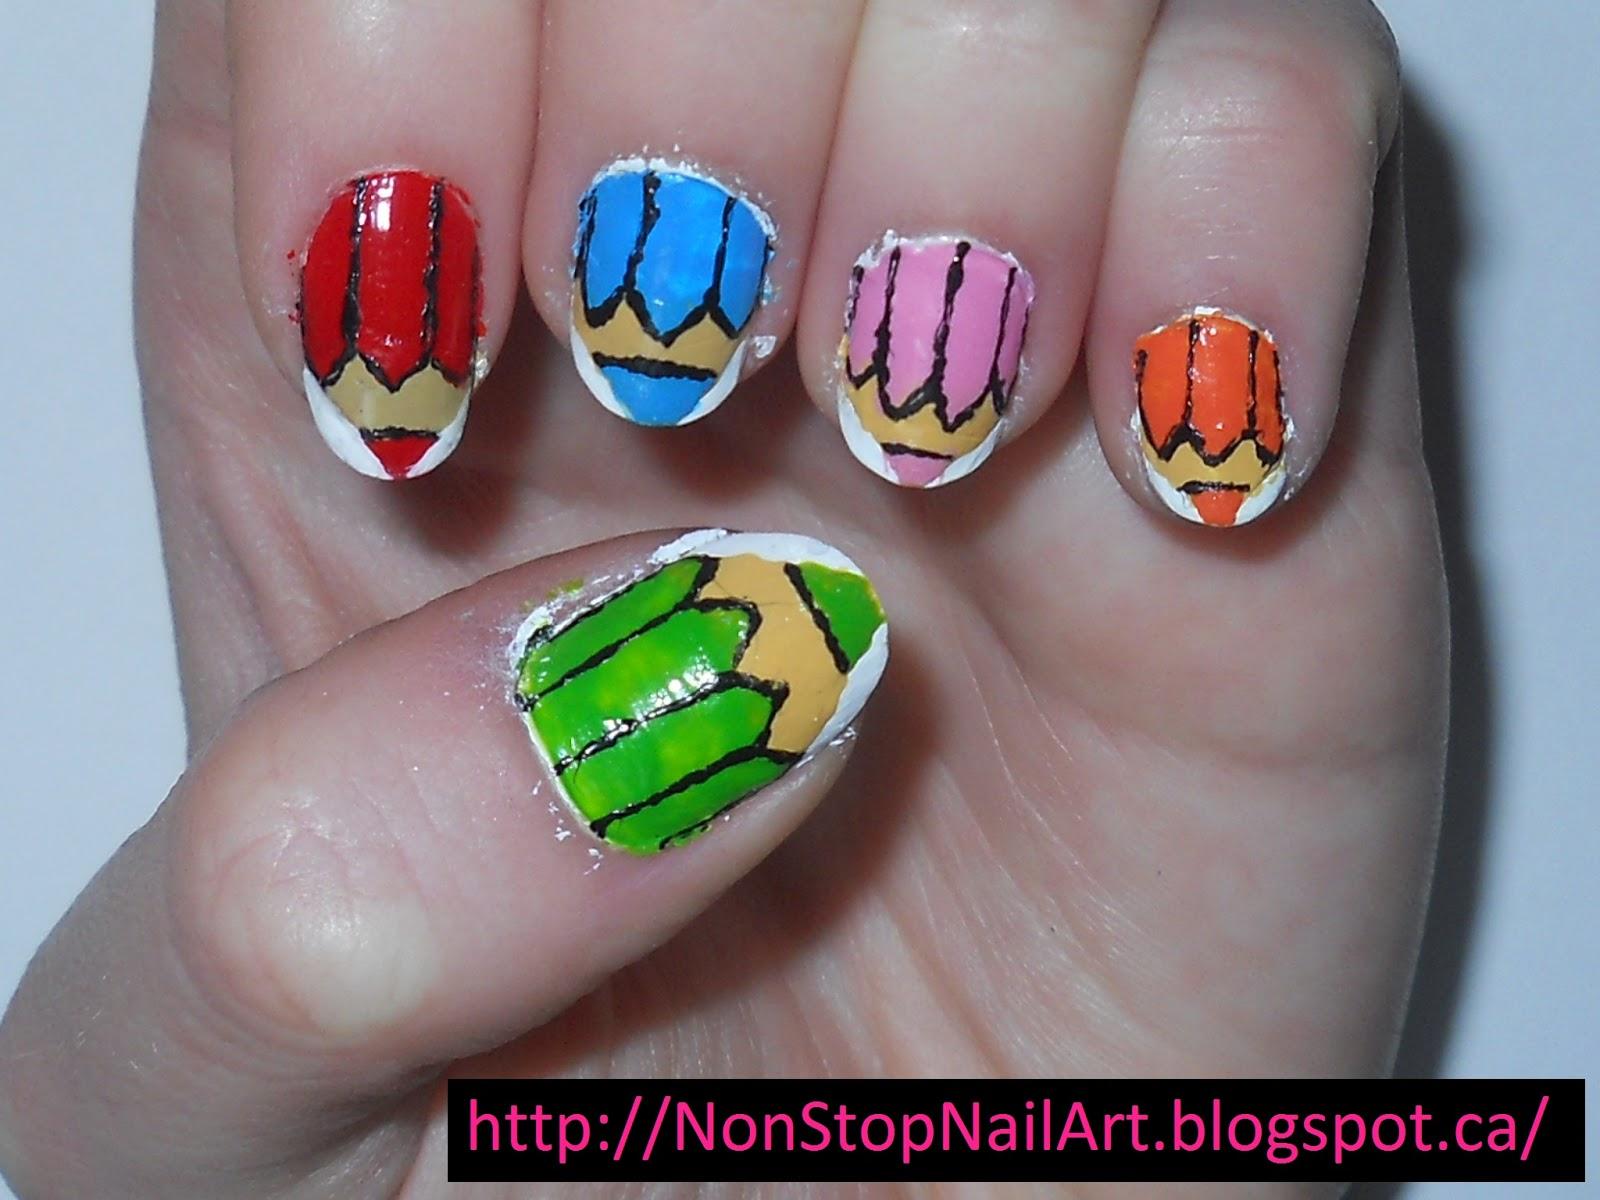 Non-Stop Nail Art: Coloured Pencil Nails!